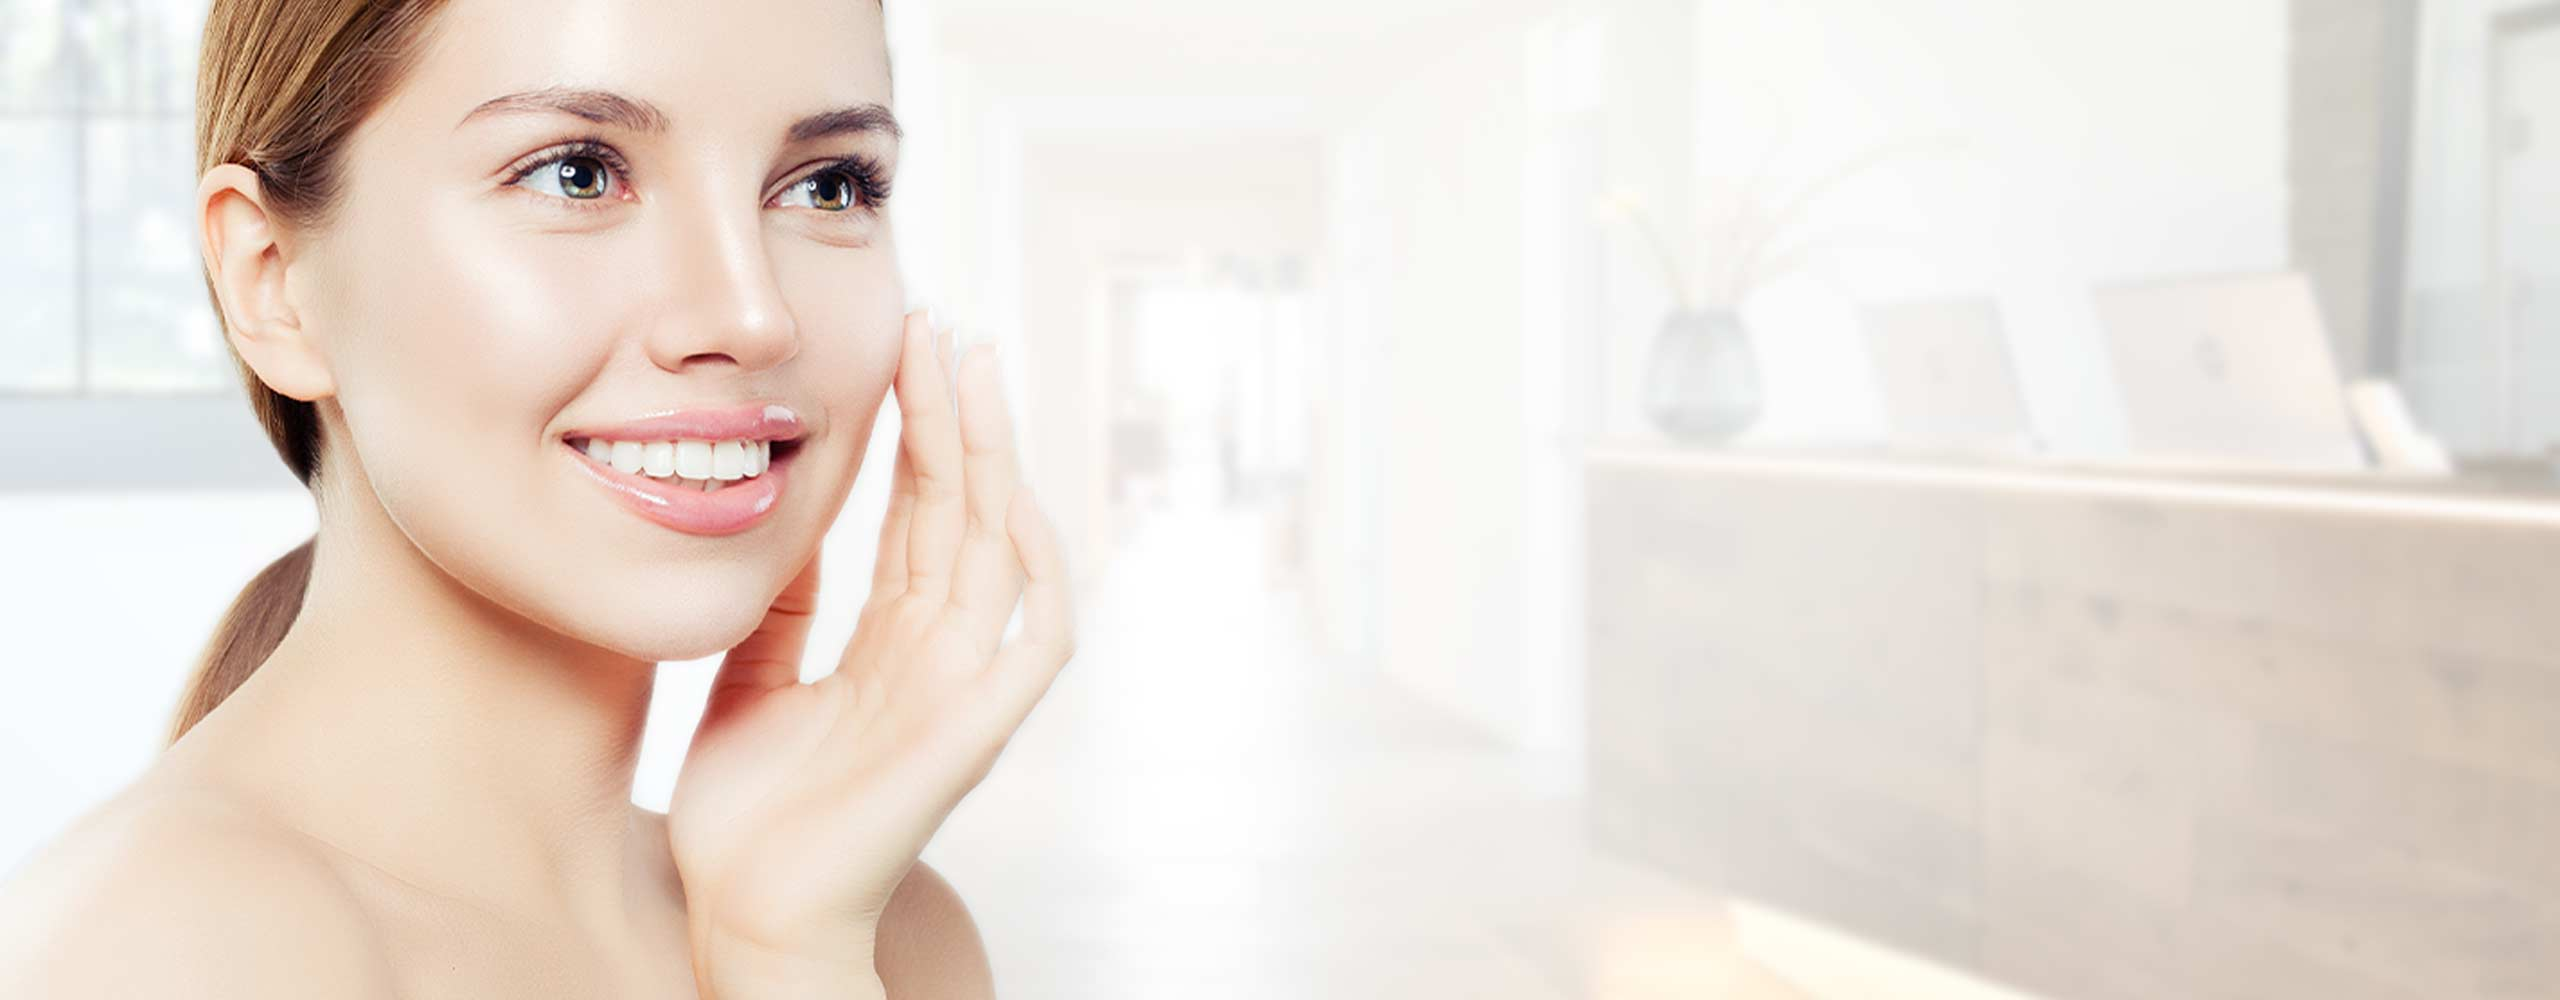 proaesthetic heidelberg schoenheitsklinik unterspritzungen nasolabial